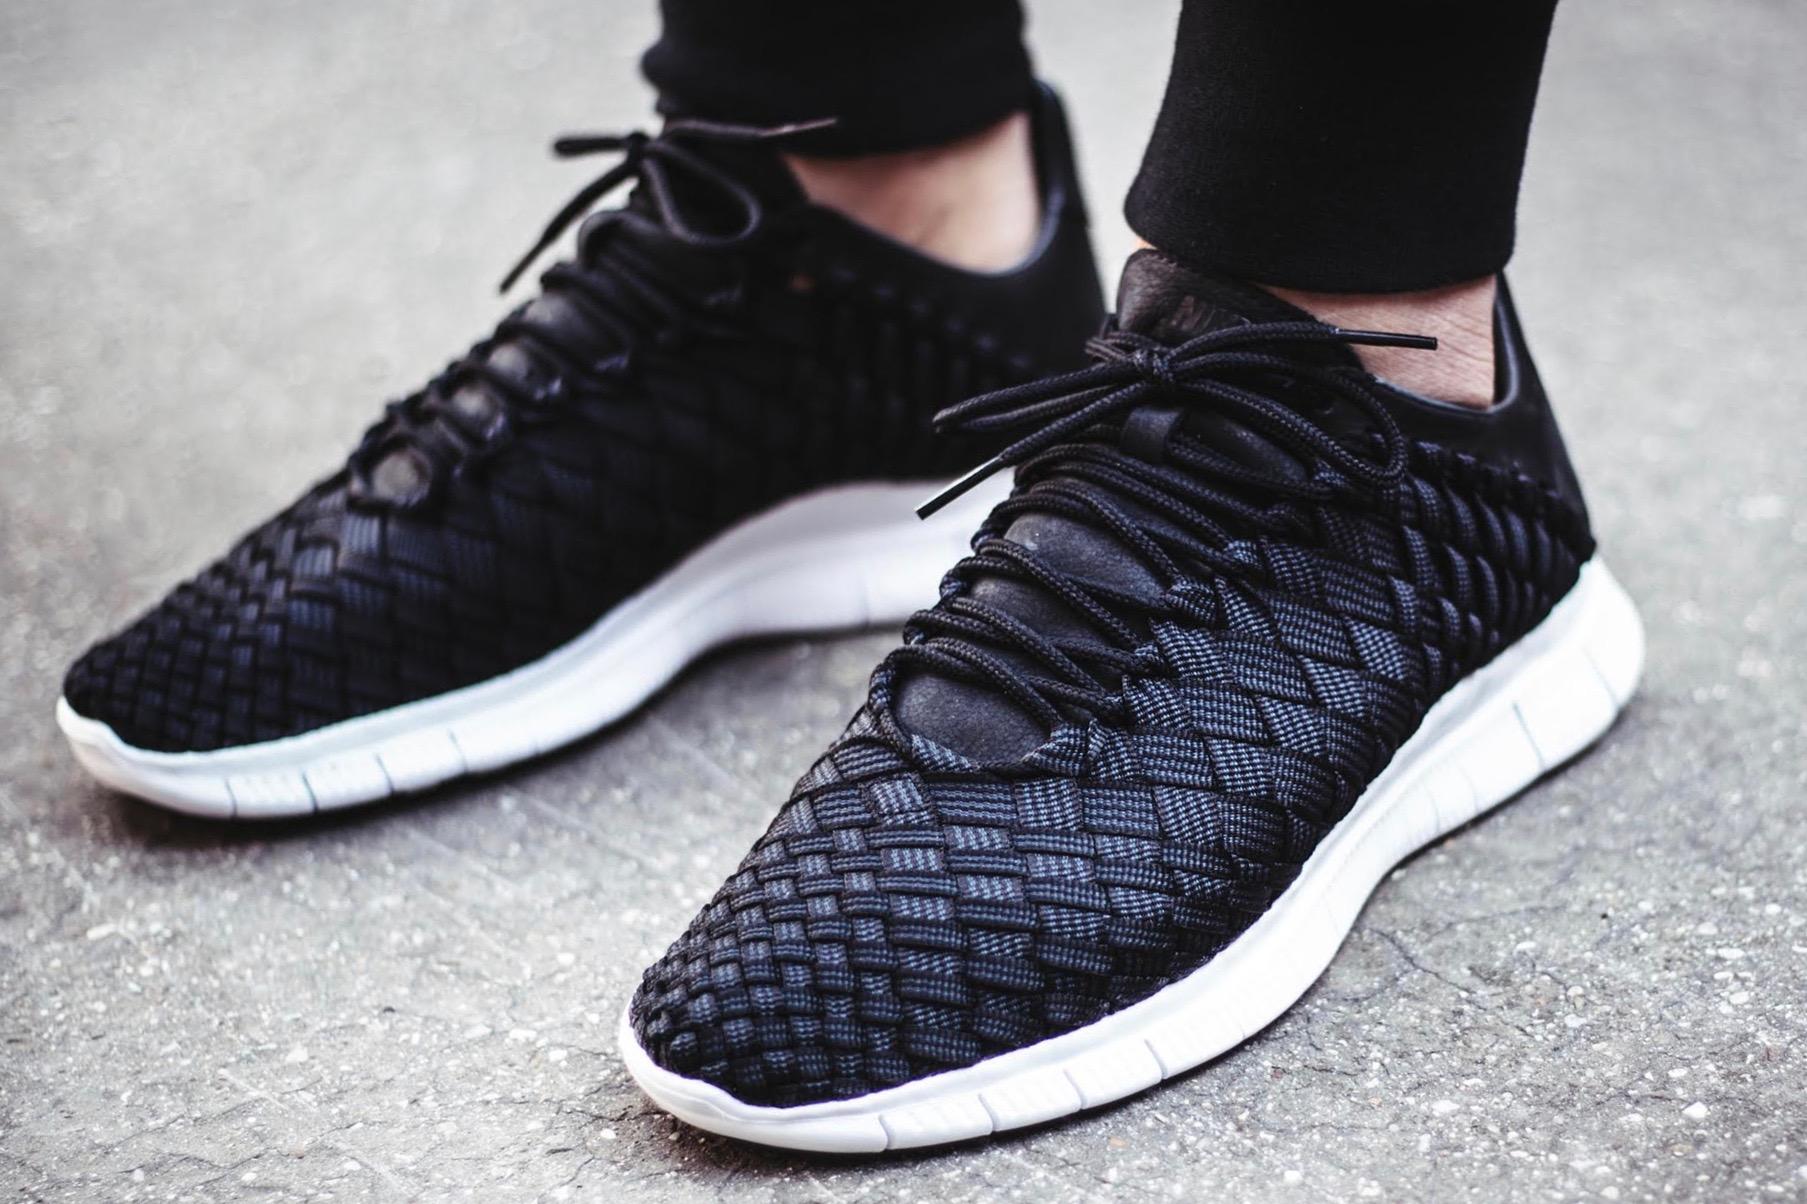 1697d8d7d3cd ... EU Kicks Nike Nike Free Inneva Woven – (On Foot) BSTN Release Reminder  290416 ...